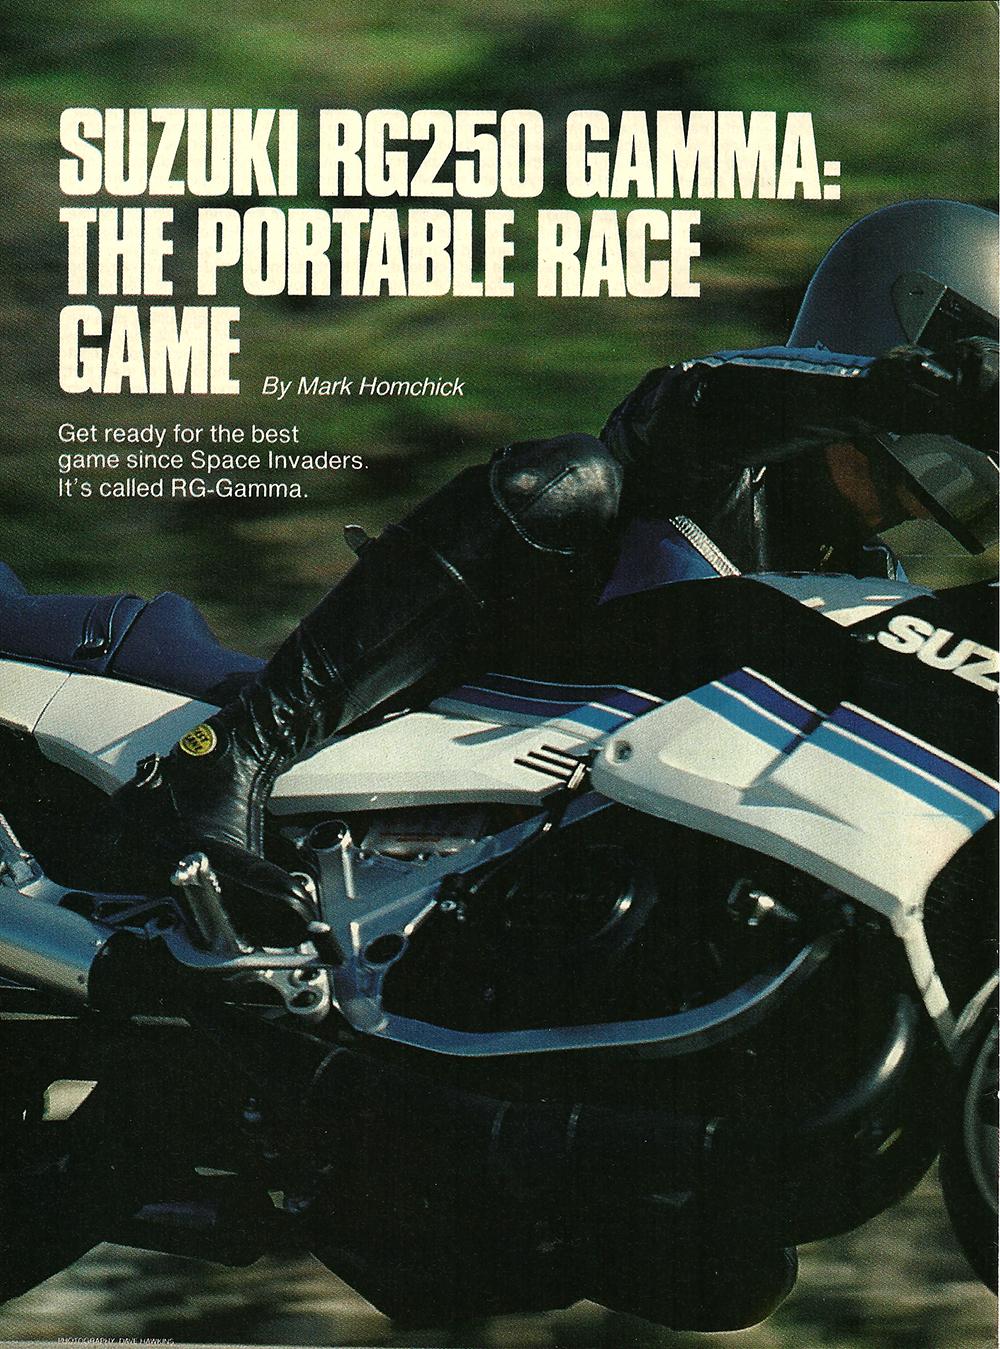 1984 Suzuki RG250 Gamma road test 1.jpg